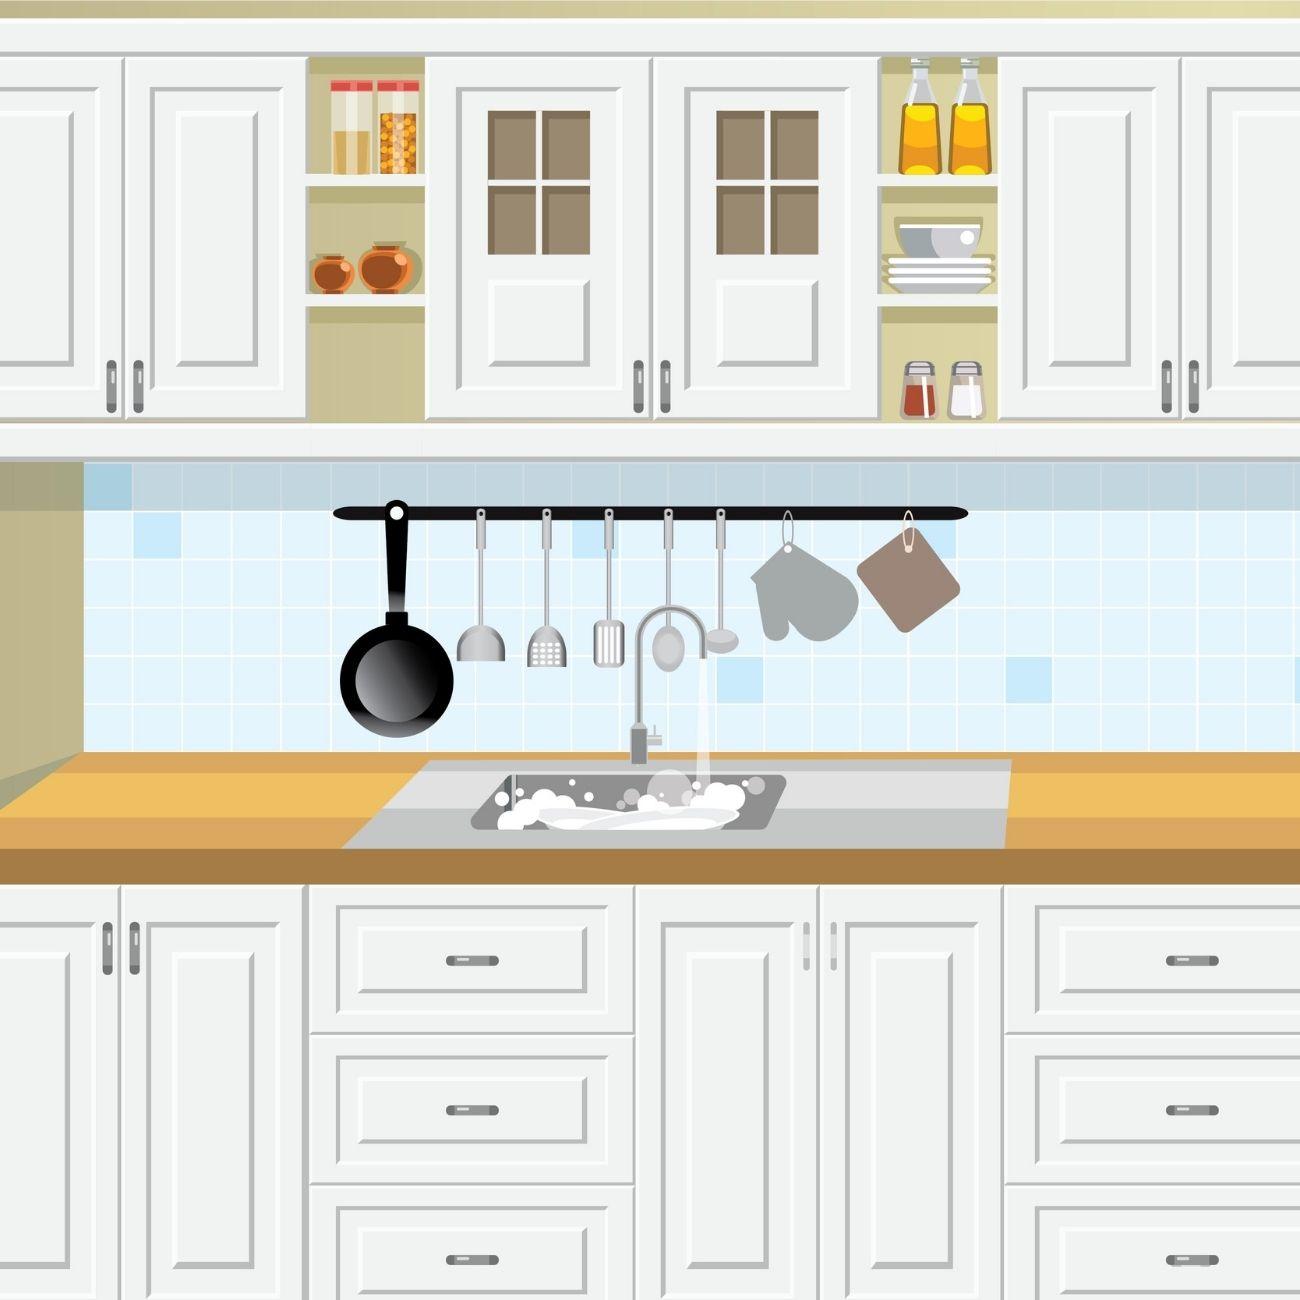 Hang A Metal Bar Over The Sink